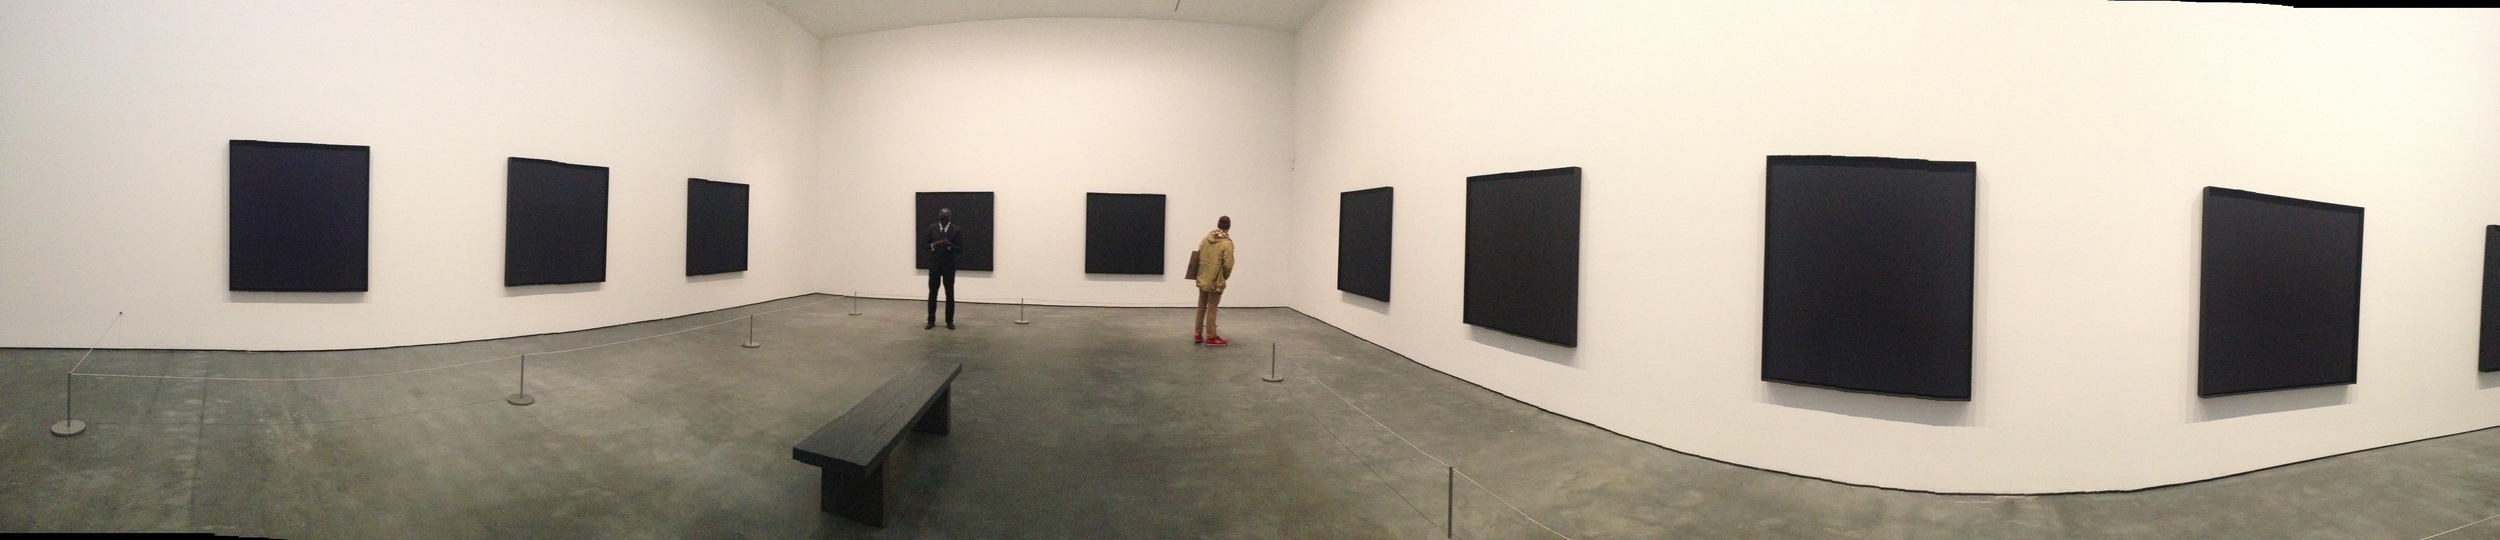 Exhibition Image, Ad Reinhardt, David Zwirner, New York Photo Credit: Cincala ArtAdvisory